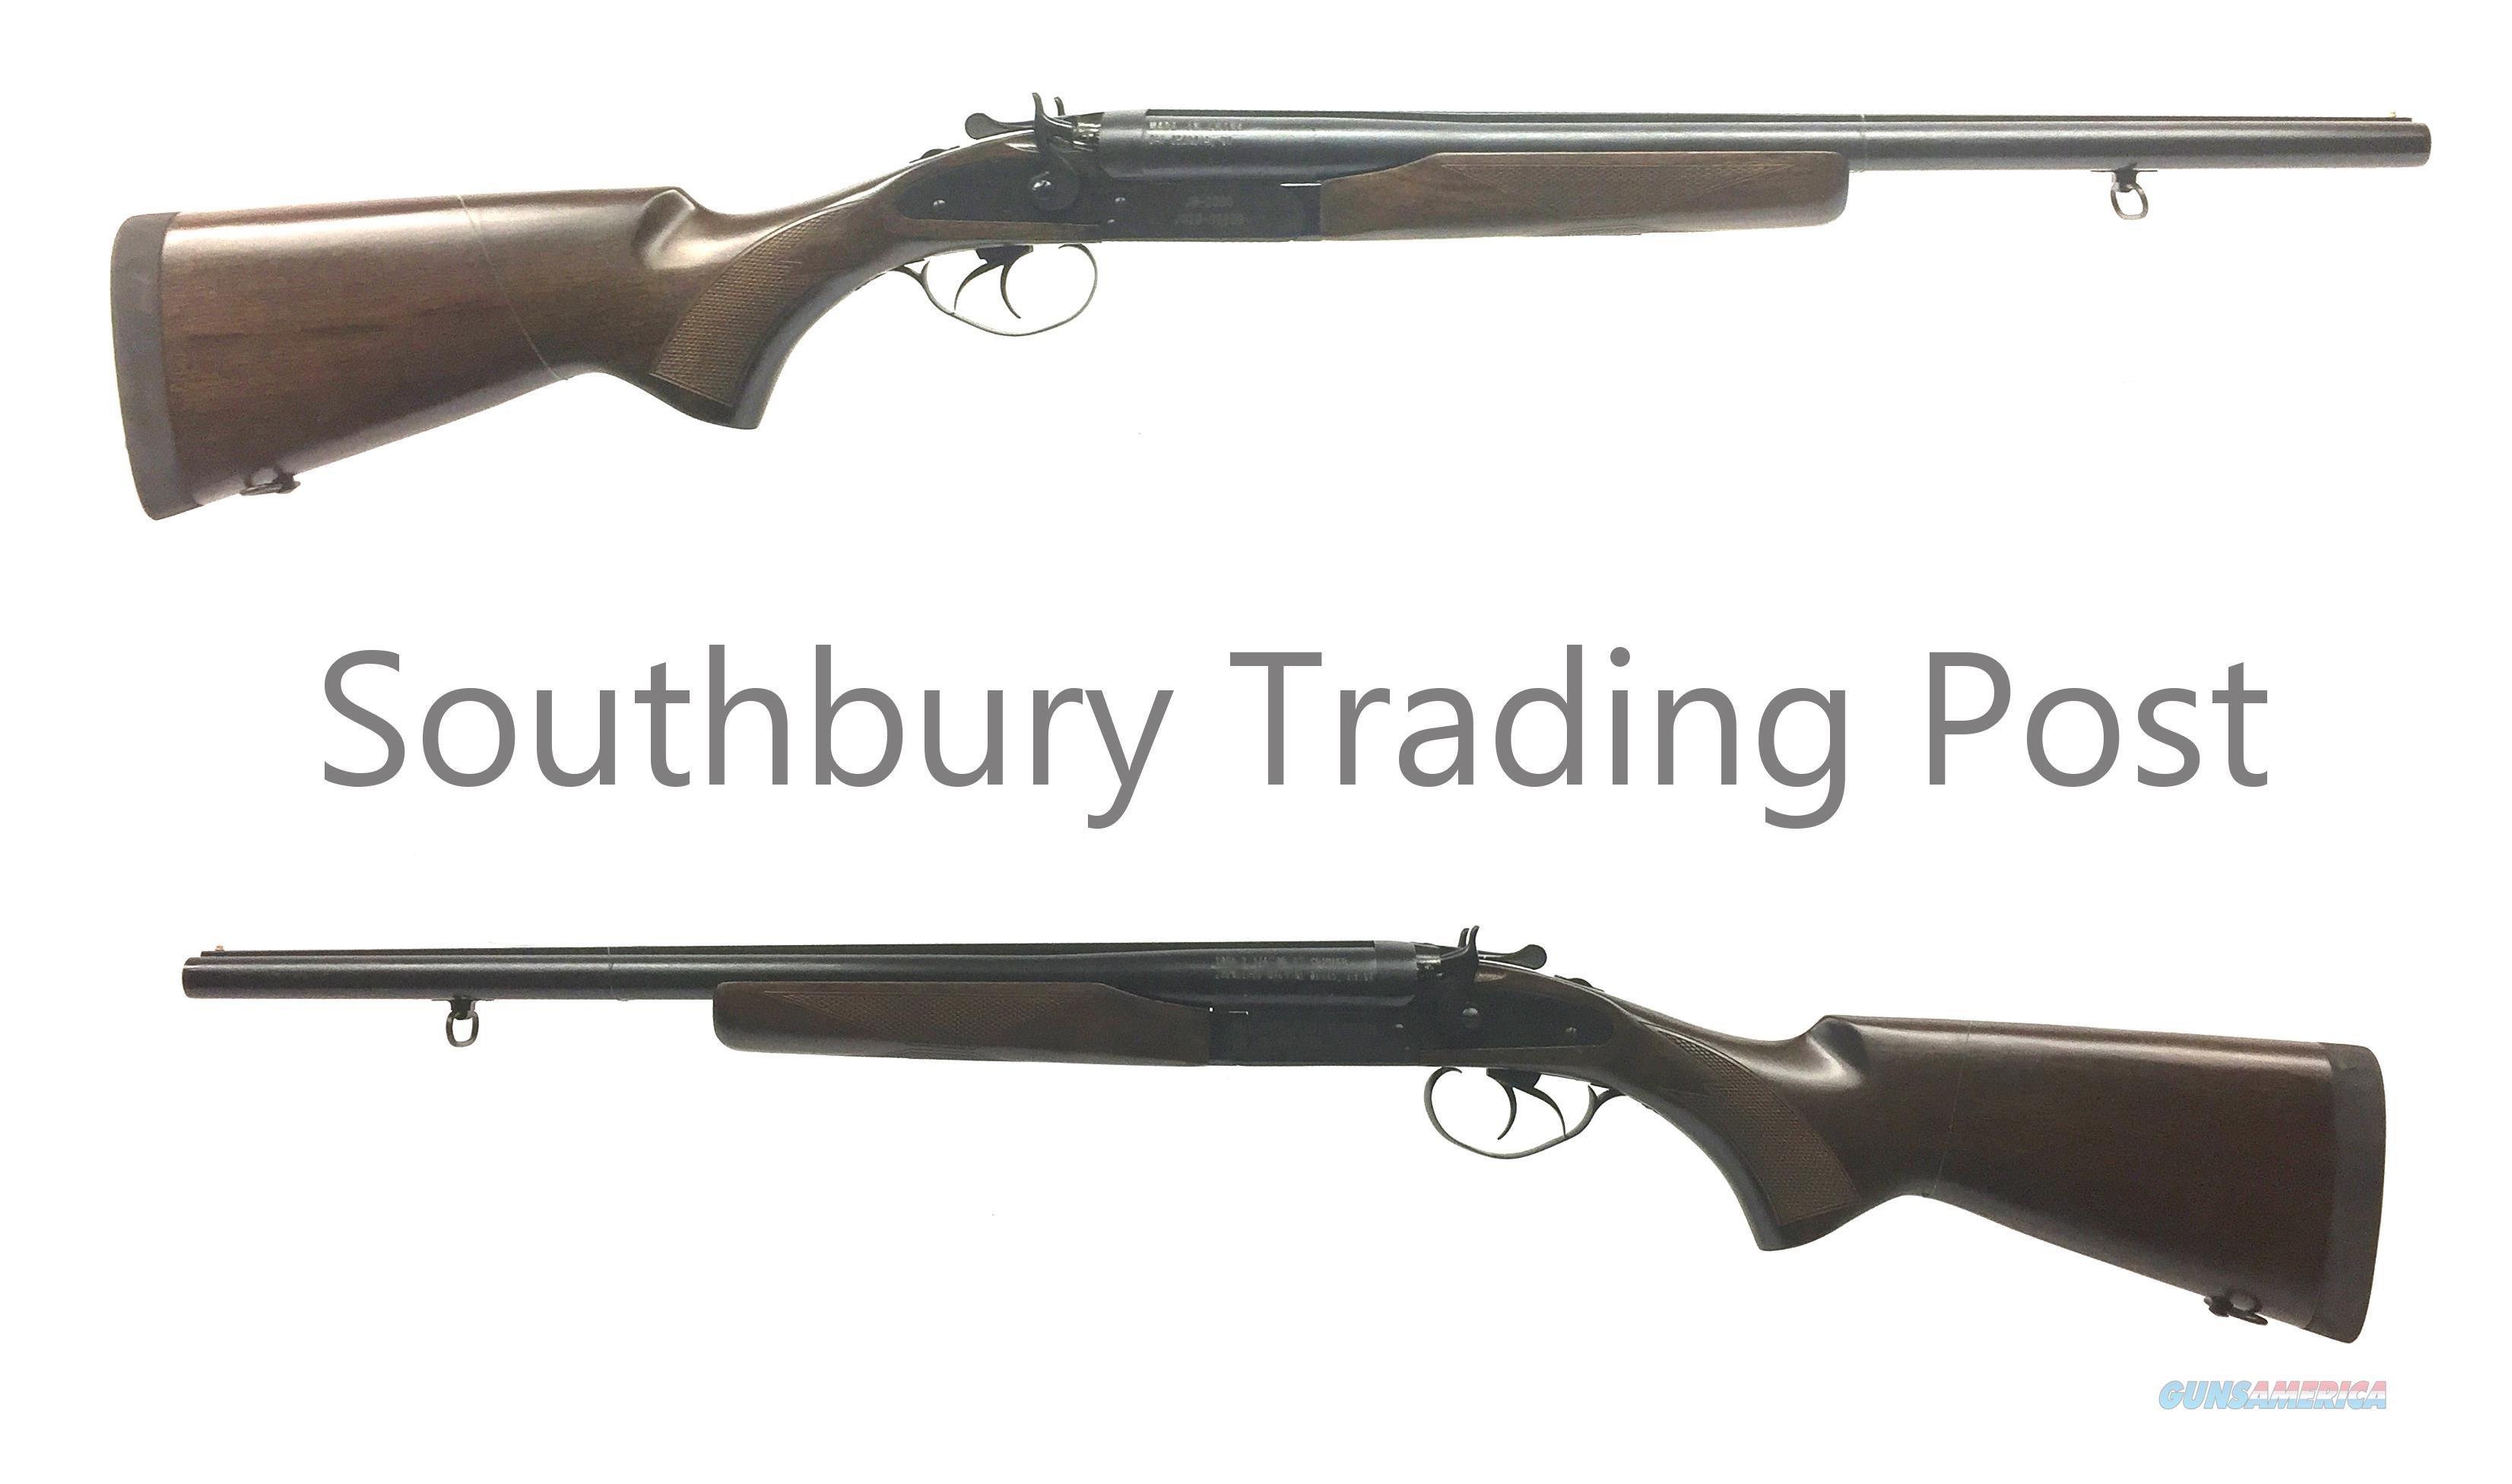 Century Arms JW2000 Coachgun 20 Gauge Shotgun  Guns > Shotguns > Century International Arms - Shotguns > Shotguns